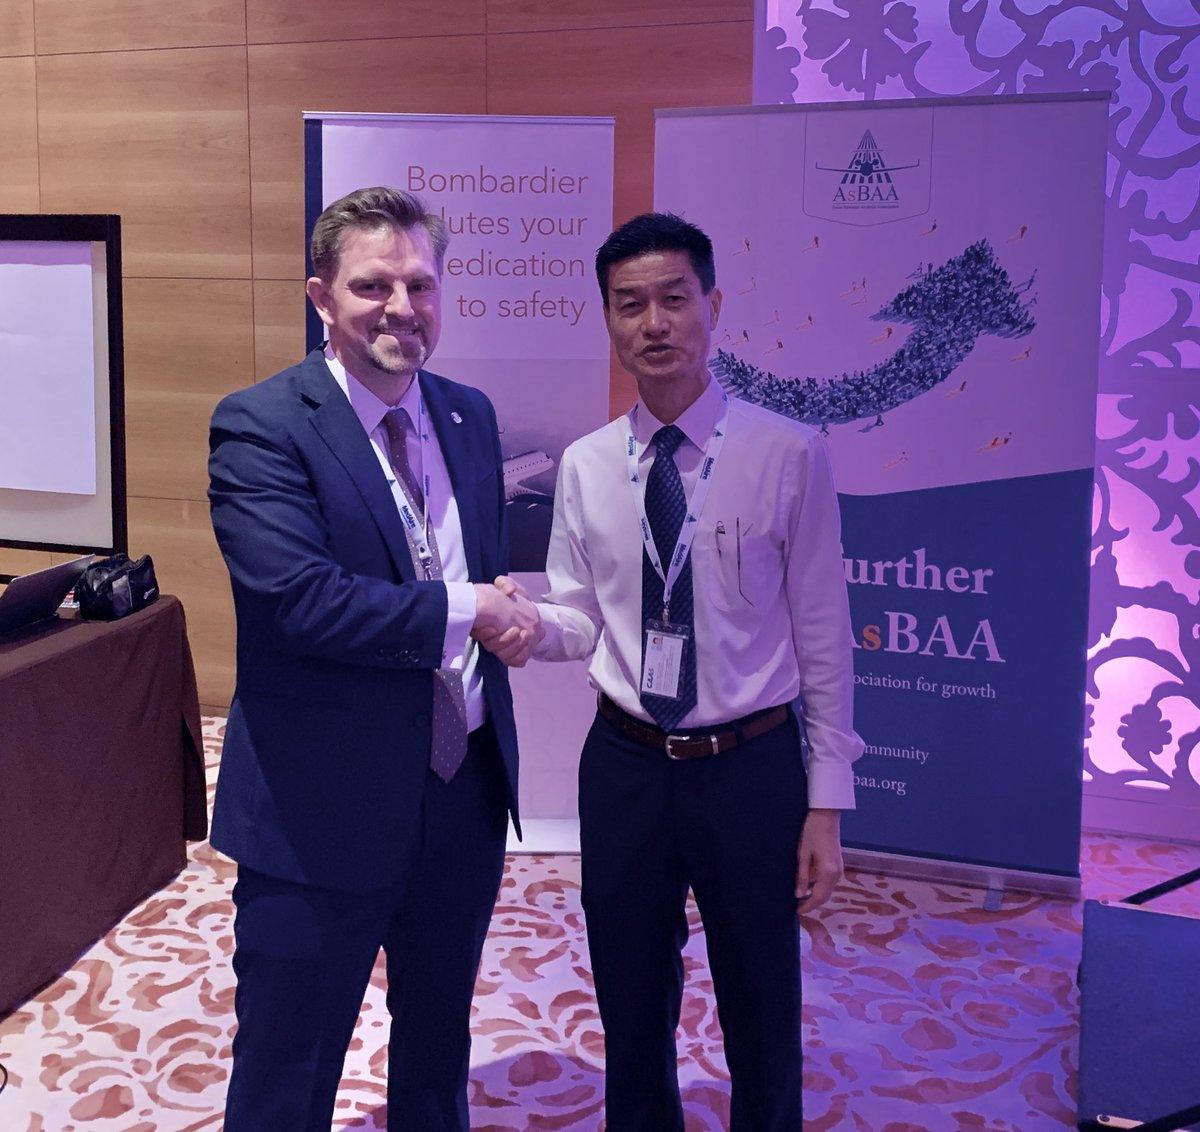 #asbaa #bizav week kicks off in #singapore - @Airside_Mike Board of Governor welcomes back @SingaporeCAAS Tan Kah Han Senior Director (Safety Regulation Group) / Director (Airworthiness Certification and UAS) @grandhyattsing #SafetyFirst @AINonline @FG_AviationNews @bizavdaily https://t.co/GGesACQVn0